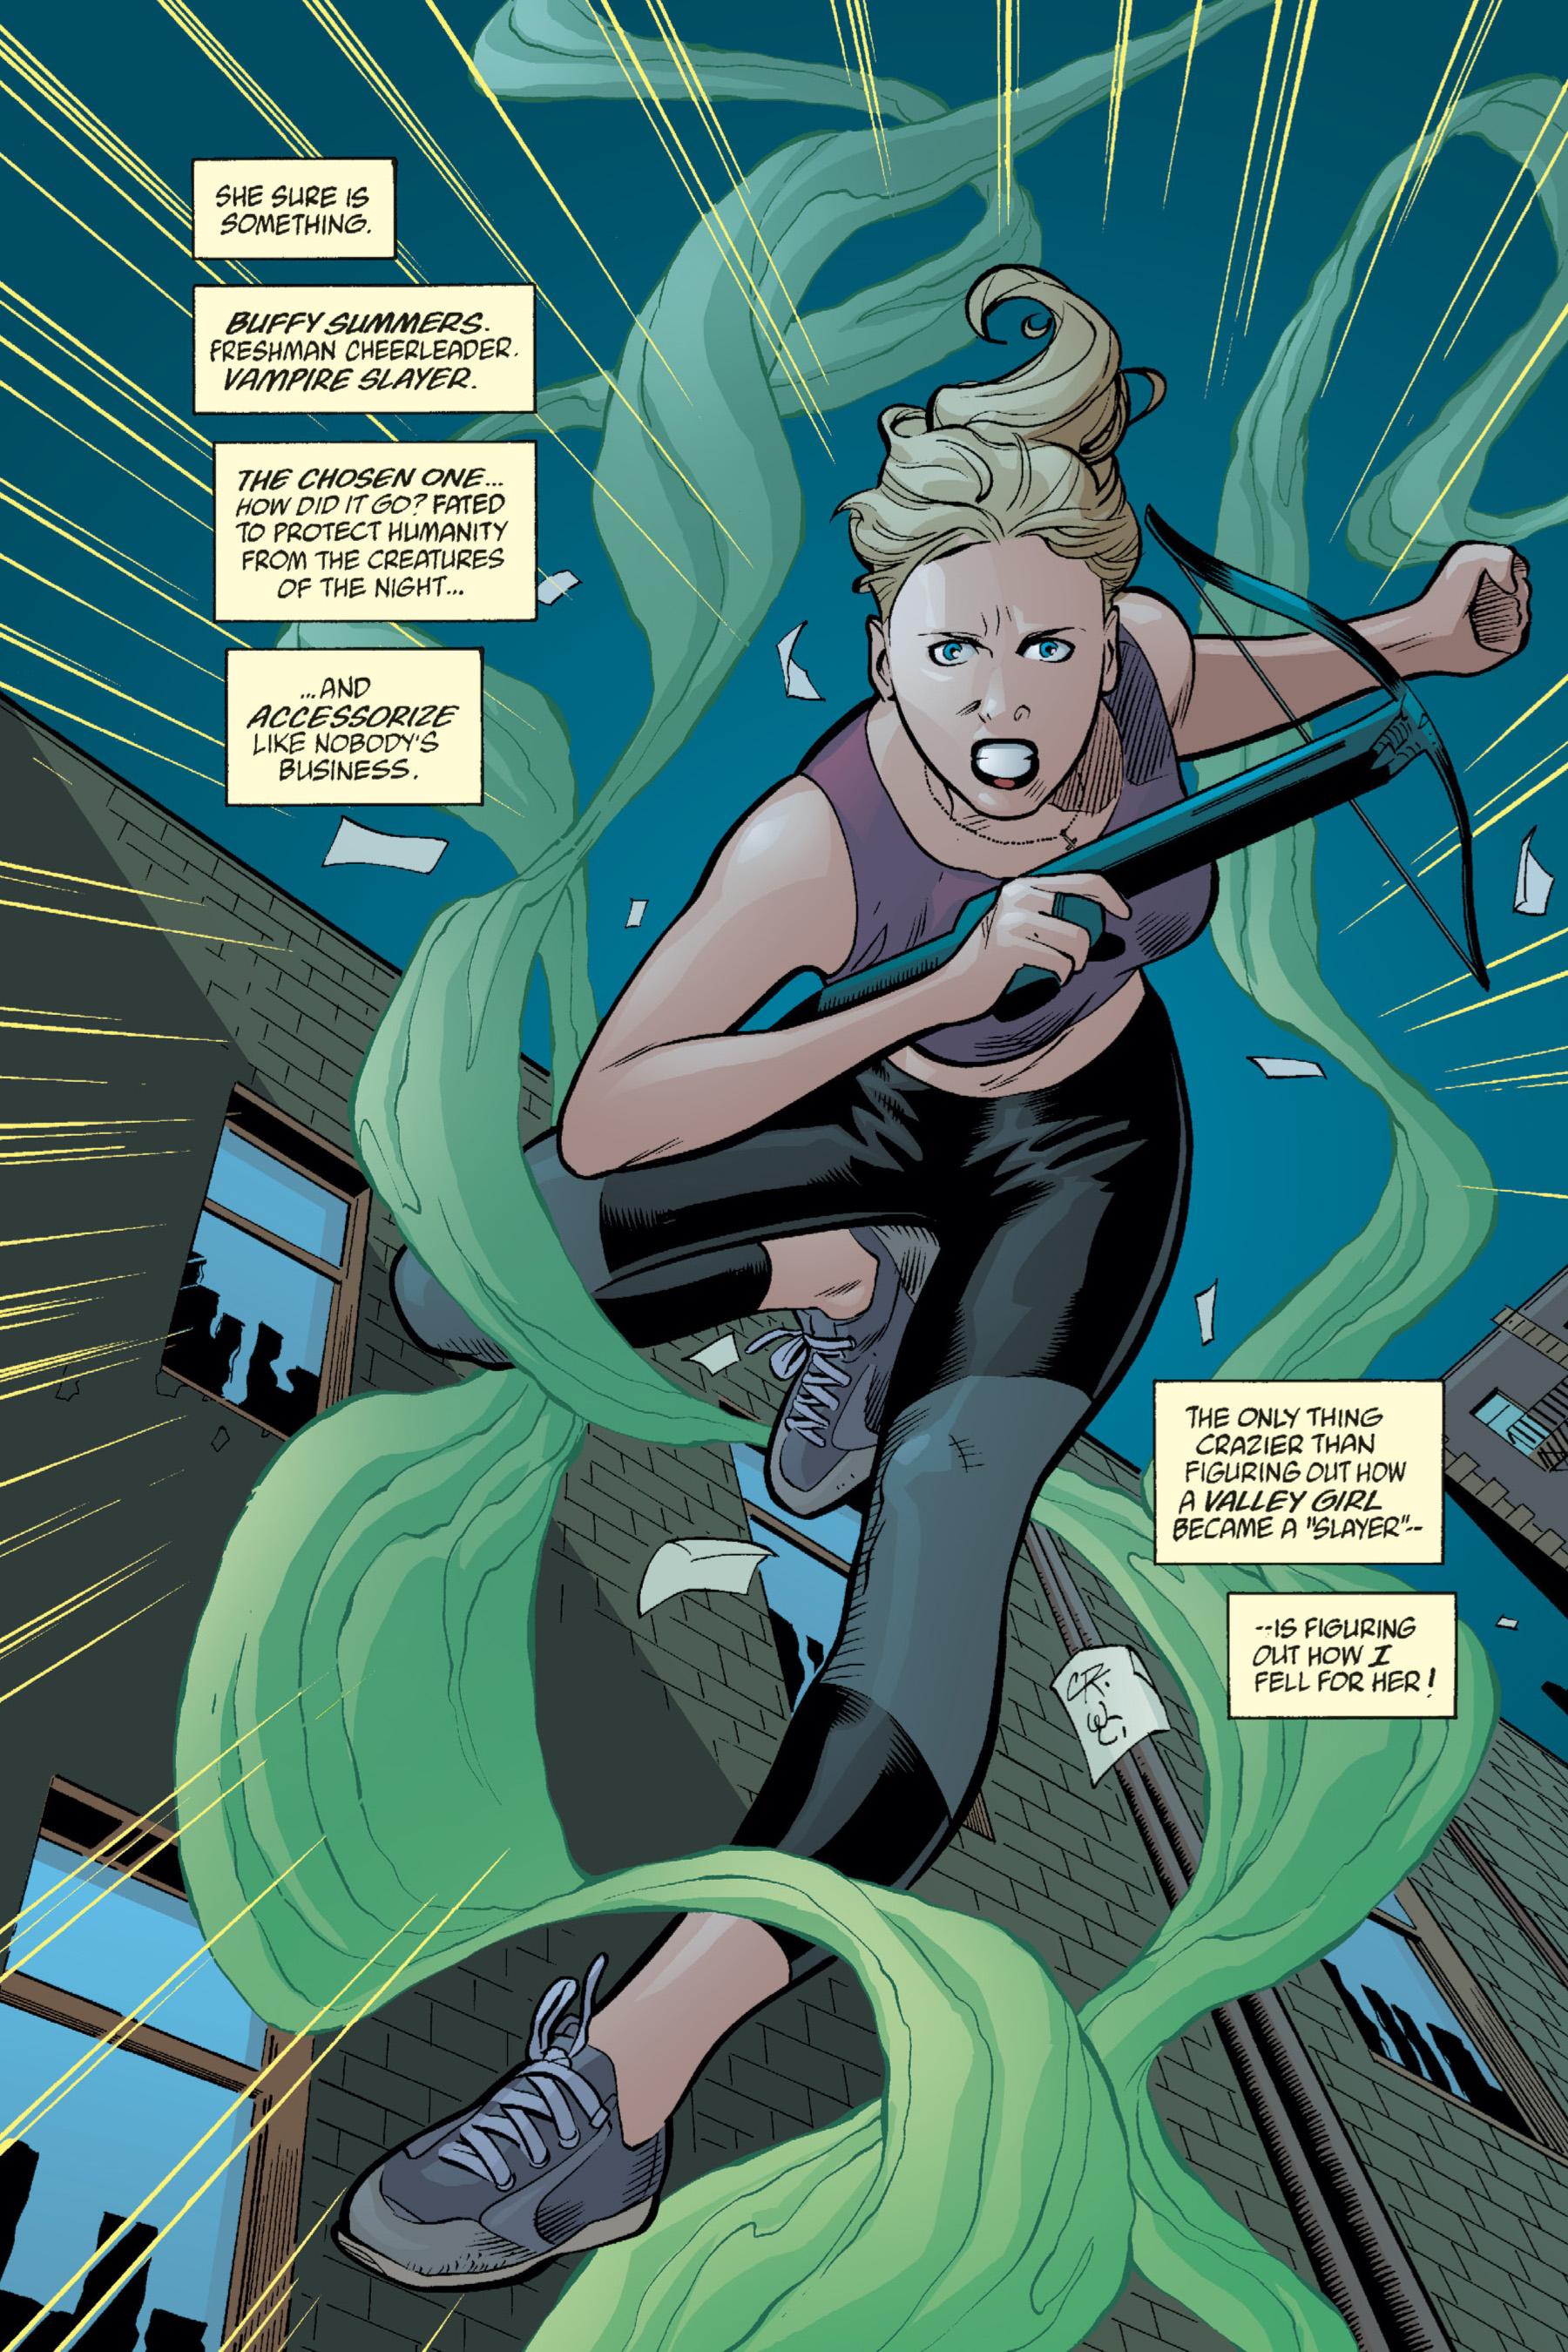 Read online Buffy the Vampire Slayer: Omnibus comic -  Issue # TPB 1 - 106